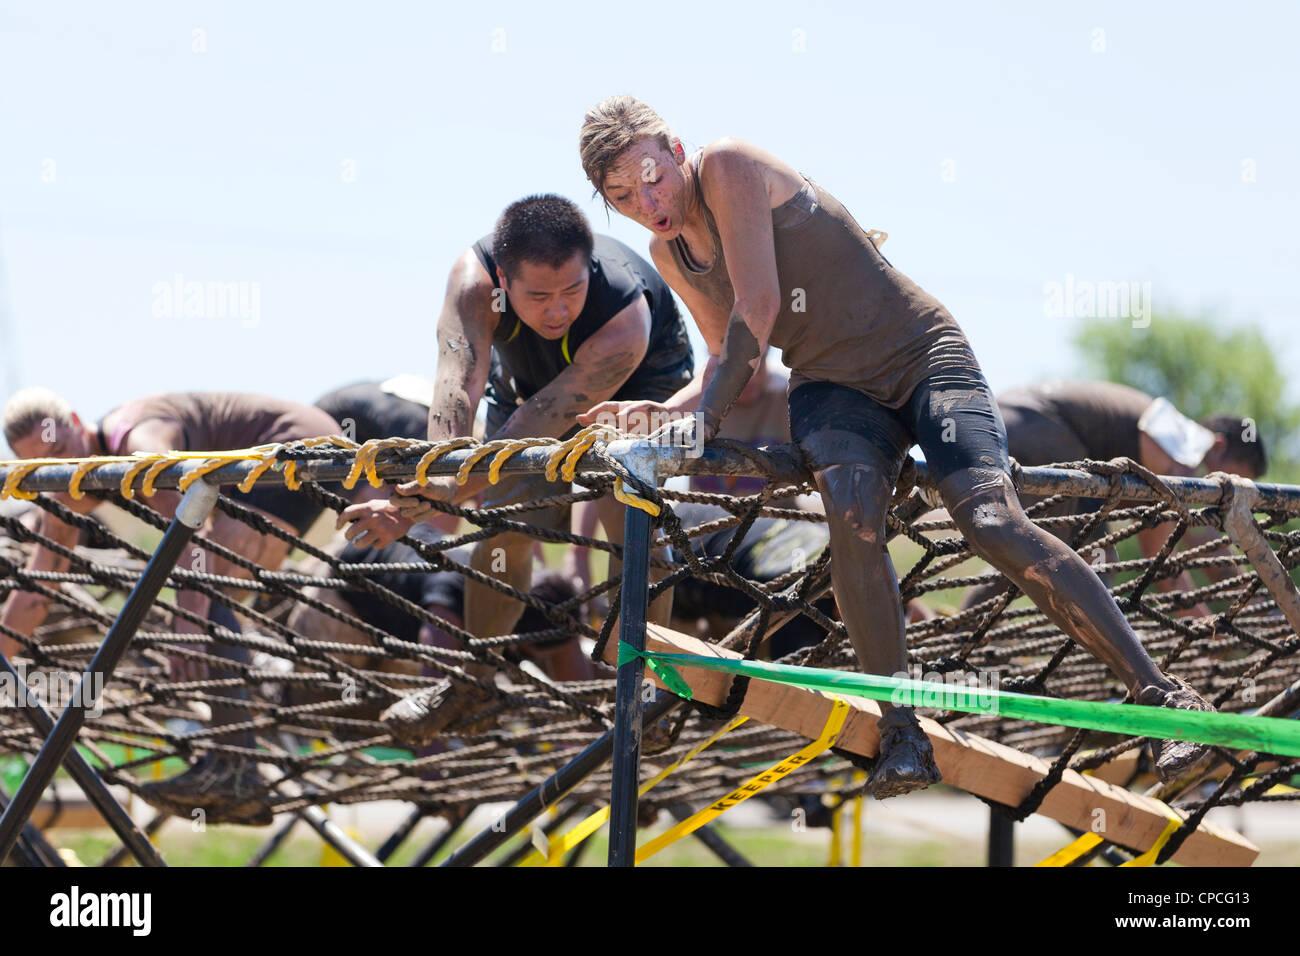 Mud race participants - Stock Image